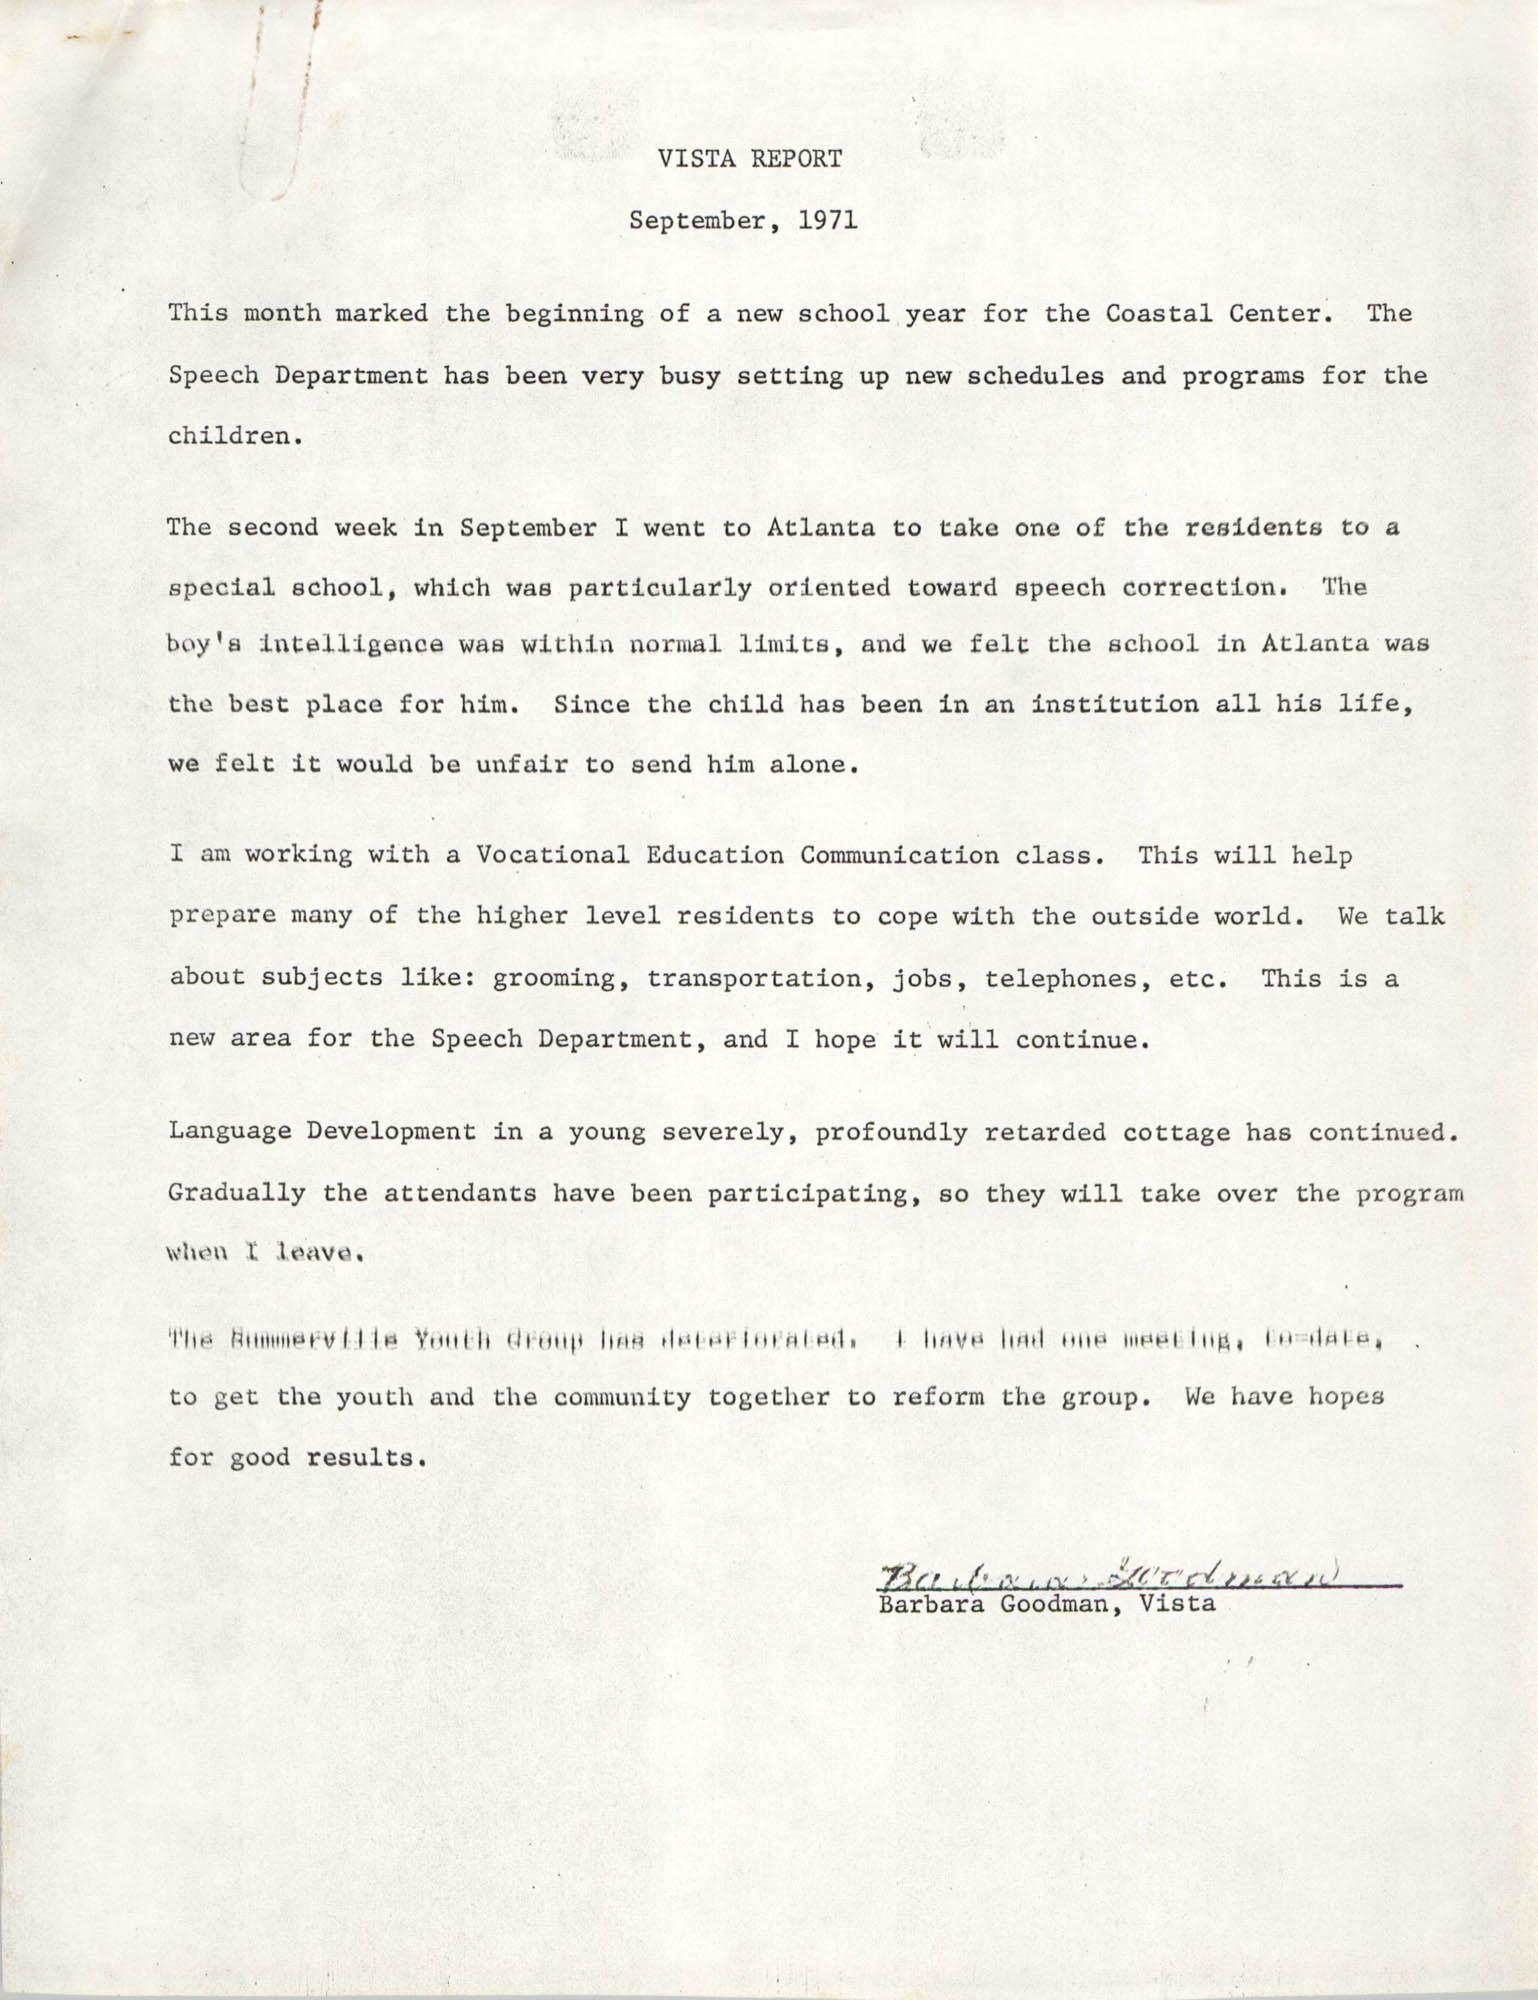 VISTA Monthly Report, September 1971